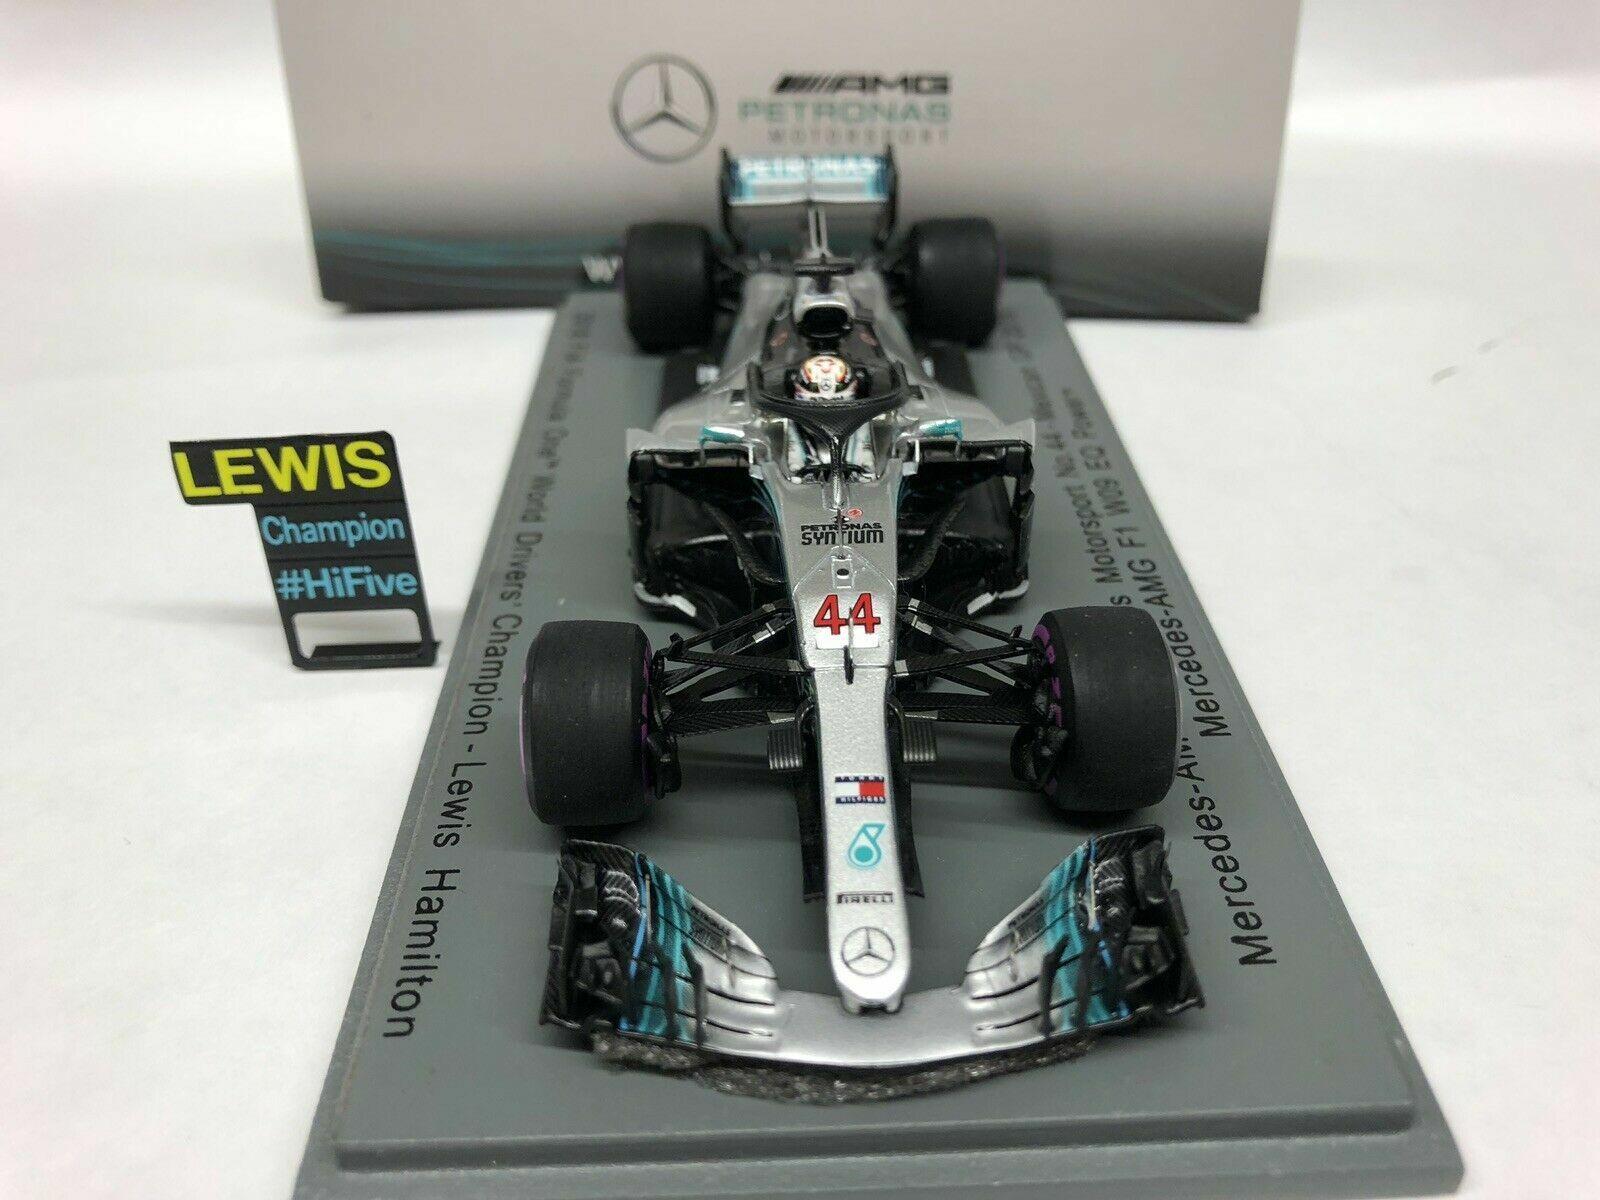 SPARK 1 43 43 43 AUTO F1 MERCEDES AMG W09 L.HAMILTON WORLD CHAMPION MESSICO 2018 S6067 90efe9